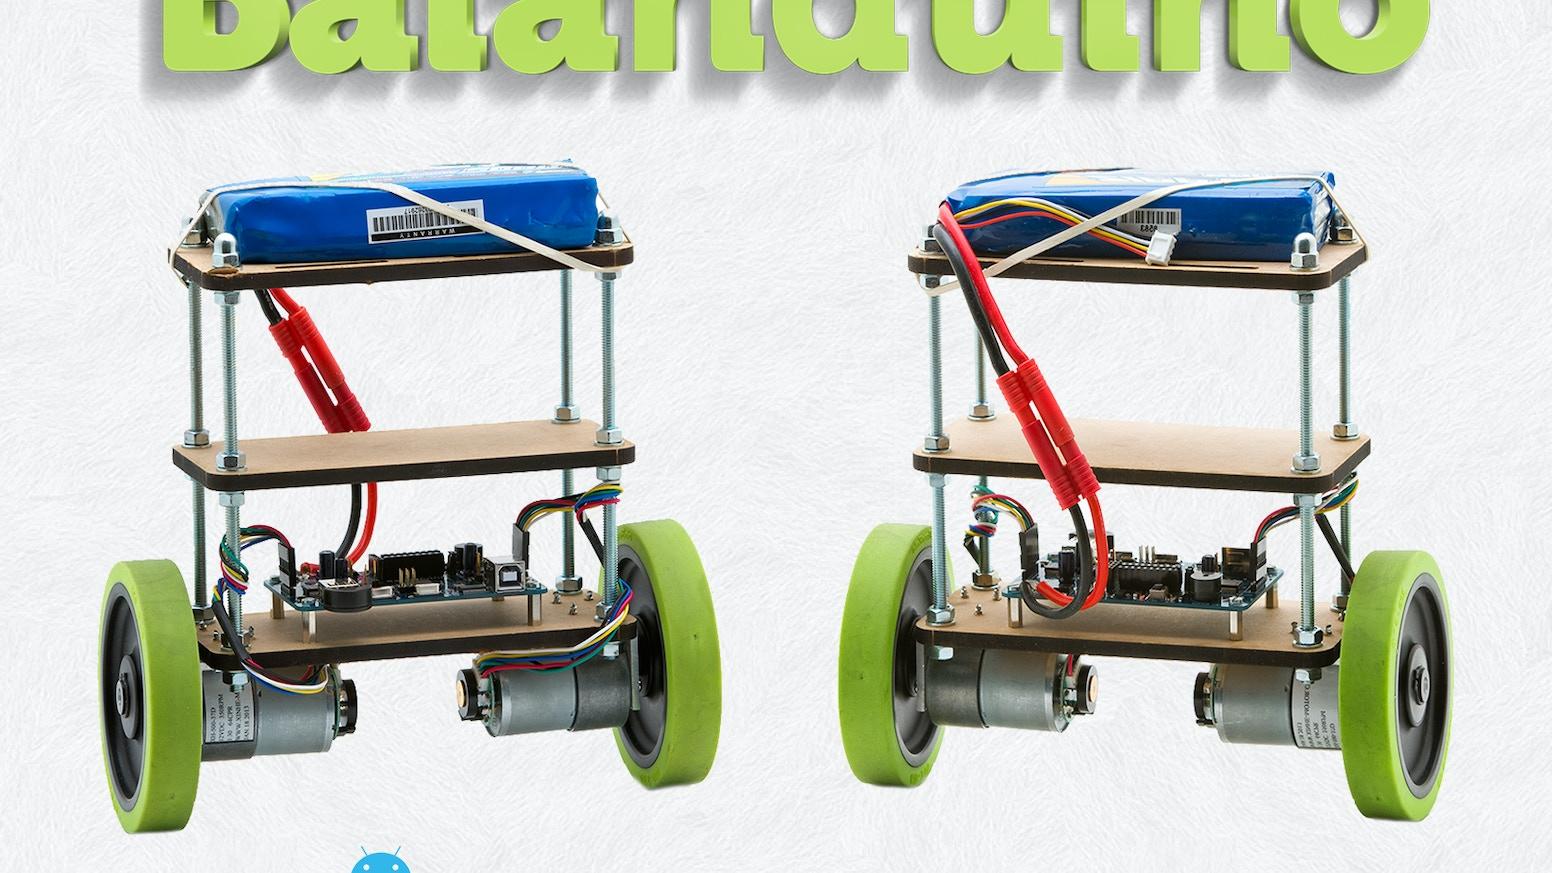 Balanduino - Balancing Robot Kit by TKJ Electronics — Kickstarter